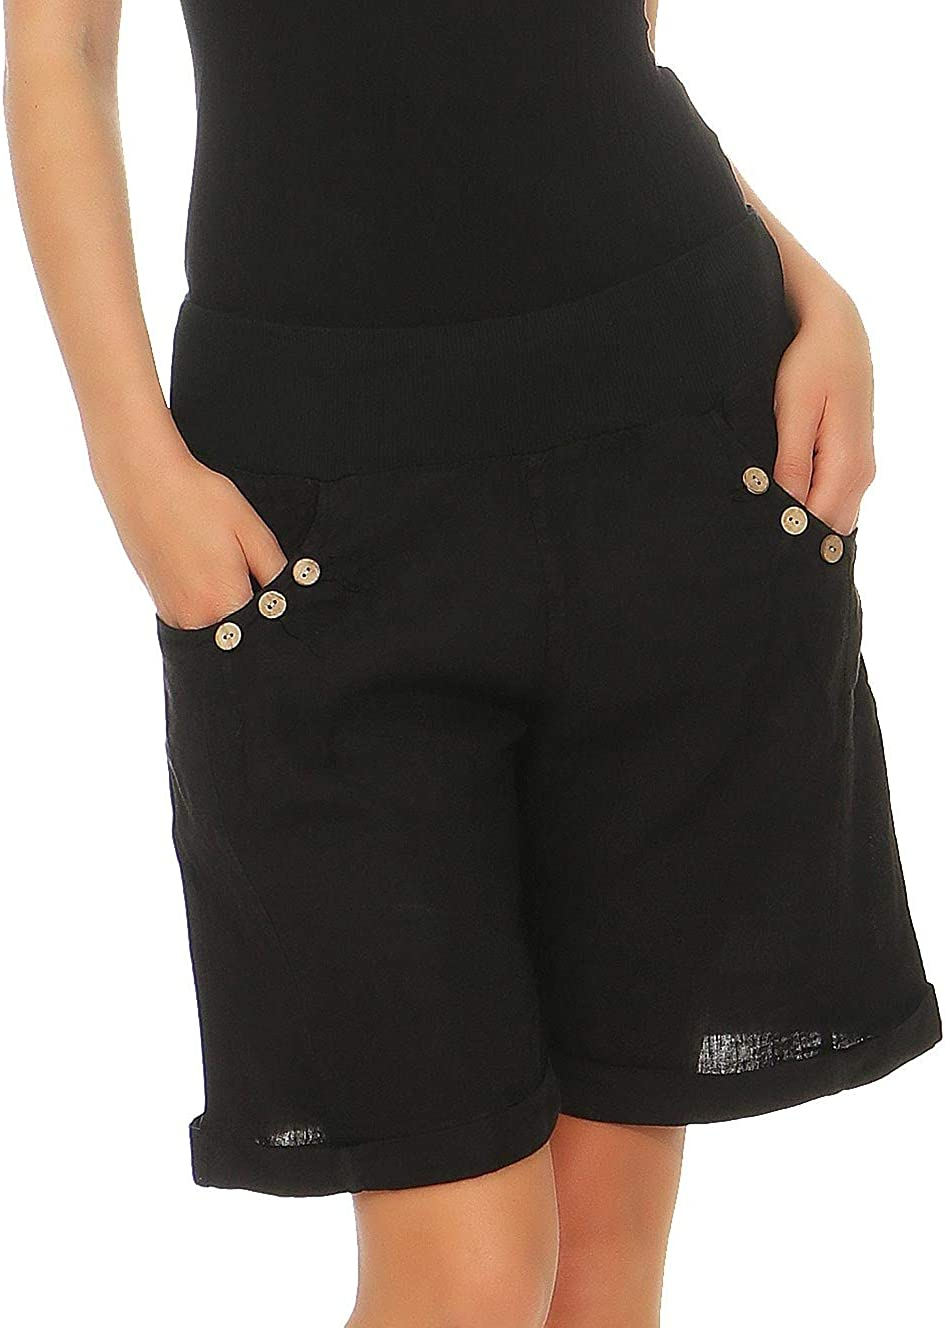 Malito Donna Lino Pantaloni Casual Bermuda Pantaloni Uni Colors 6820